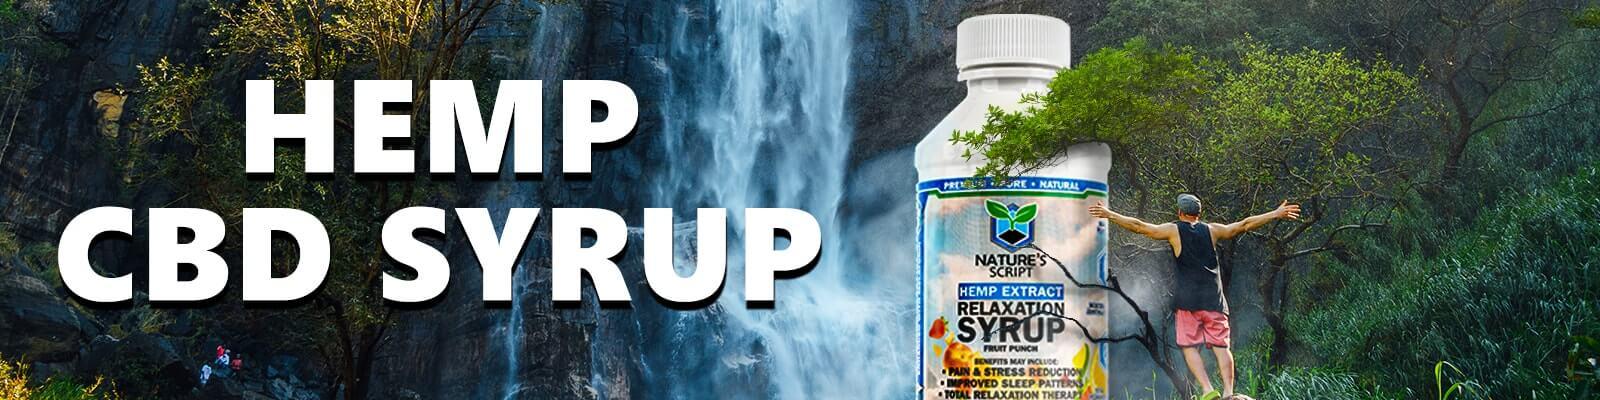 hemp cbd syrup banner